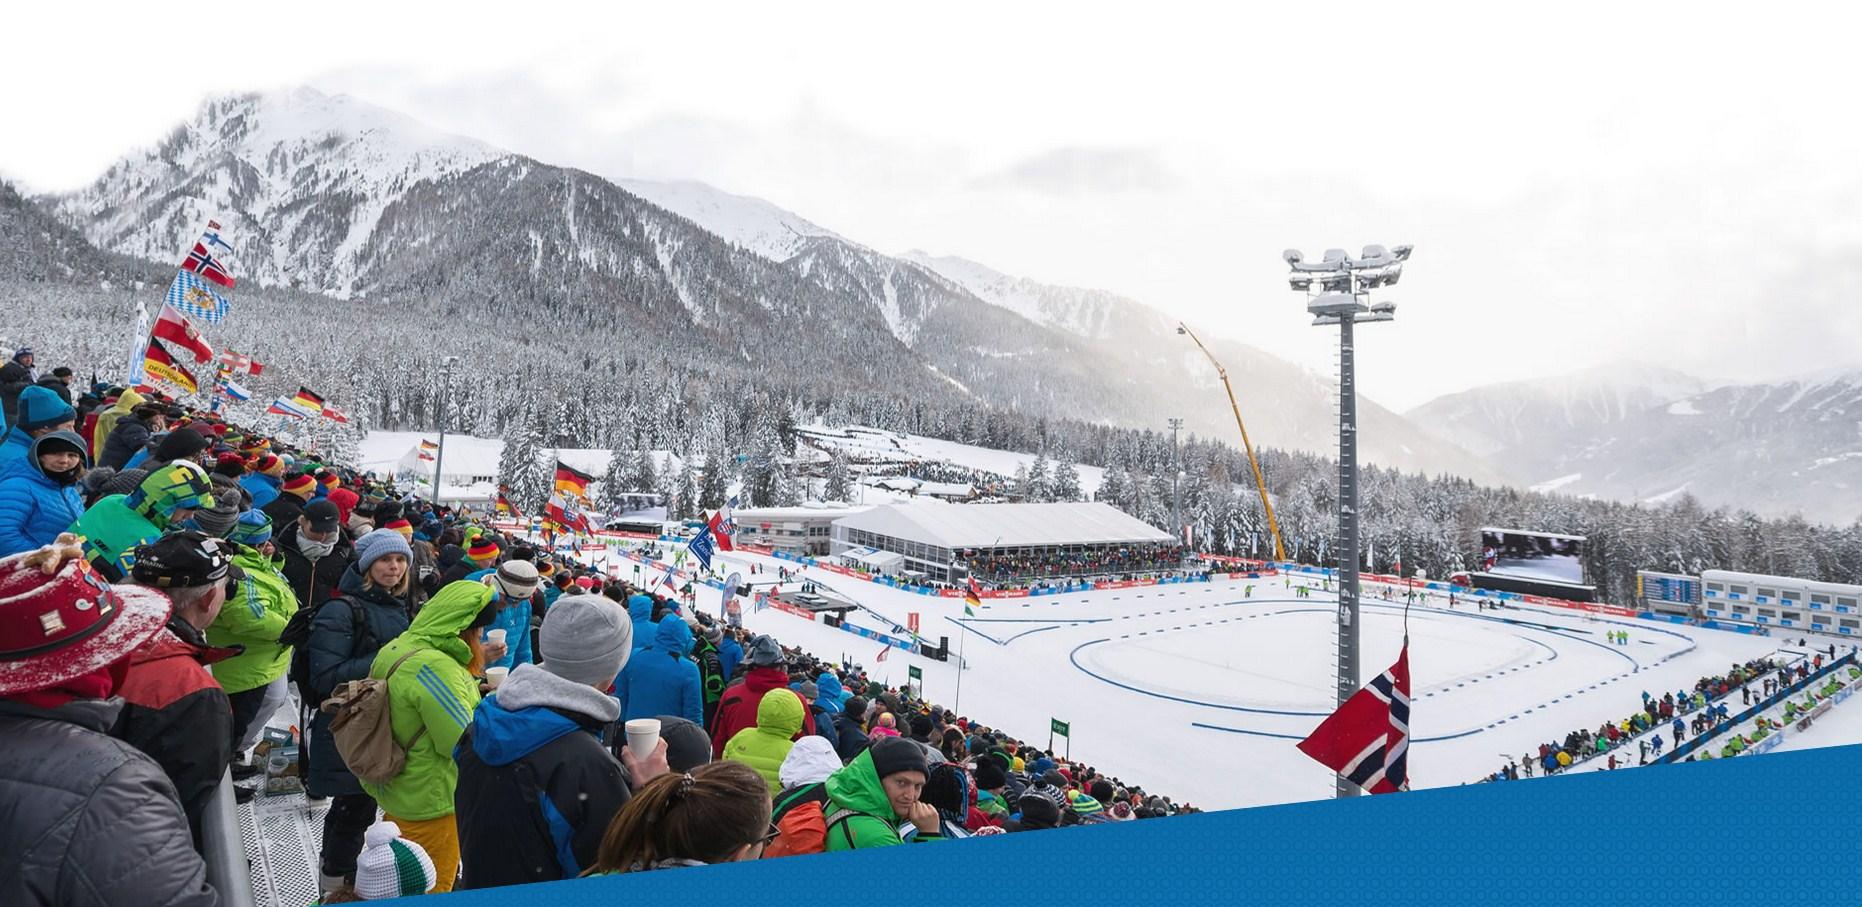 https://www.biathlon.com.ua/uploads/2020/111546.jpg